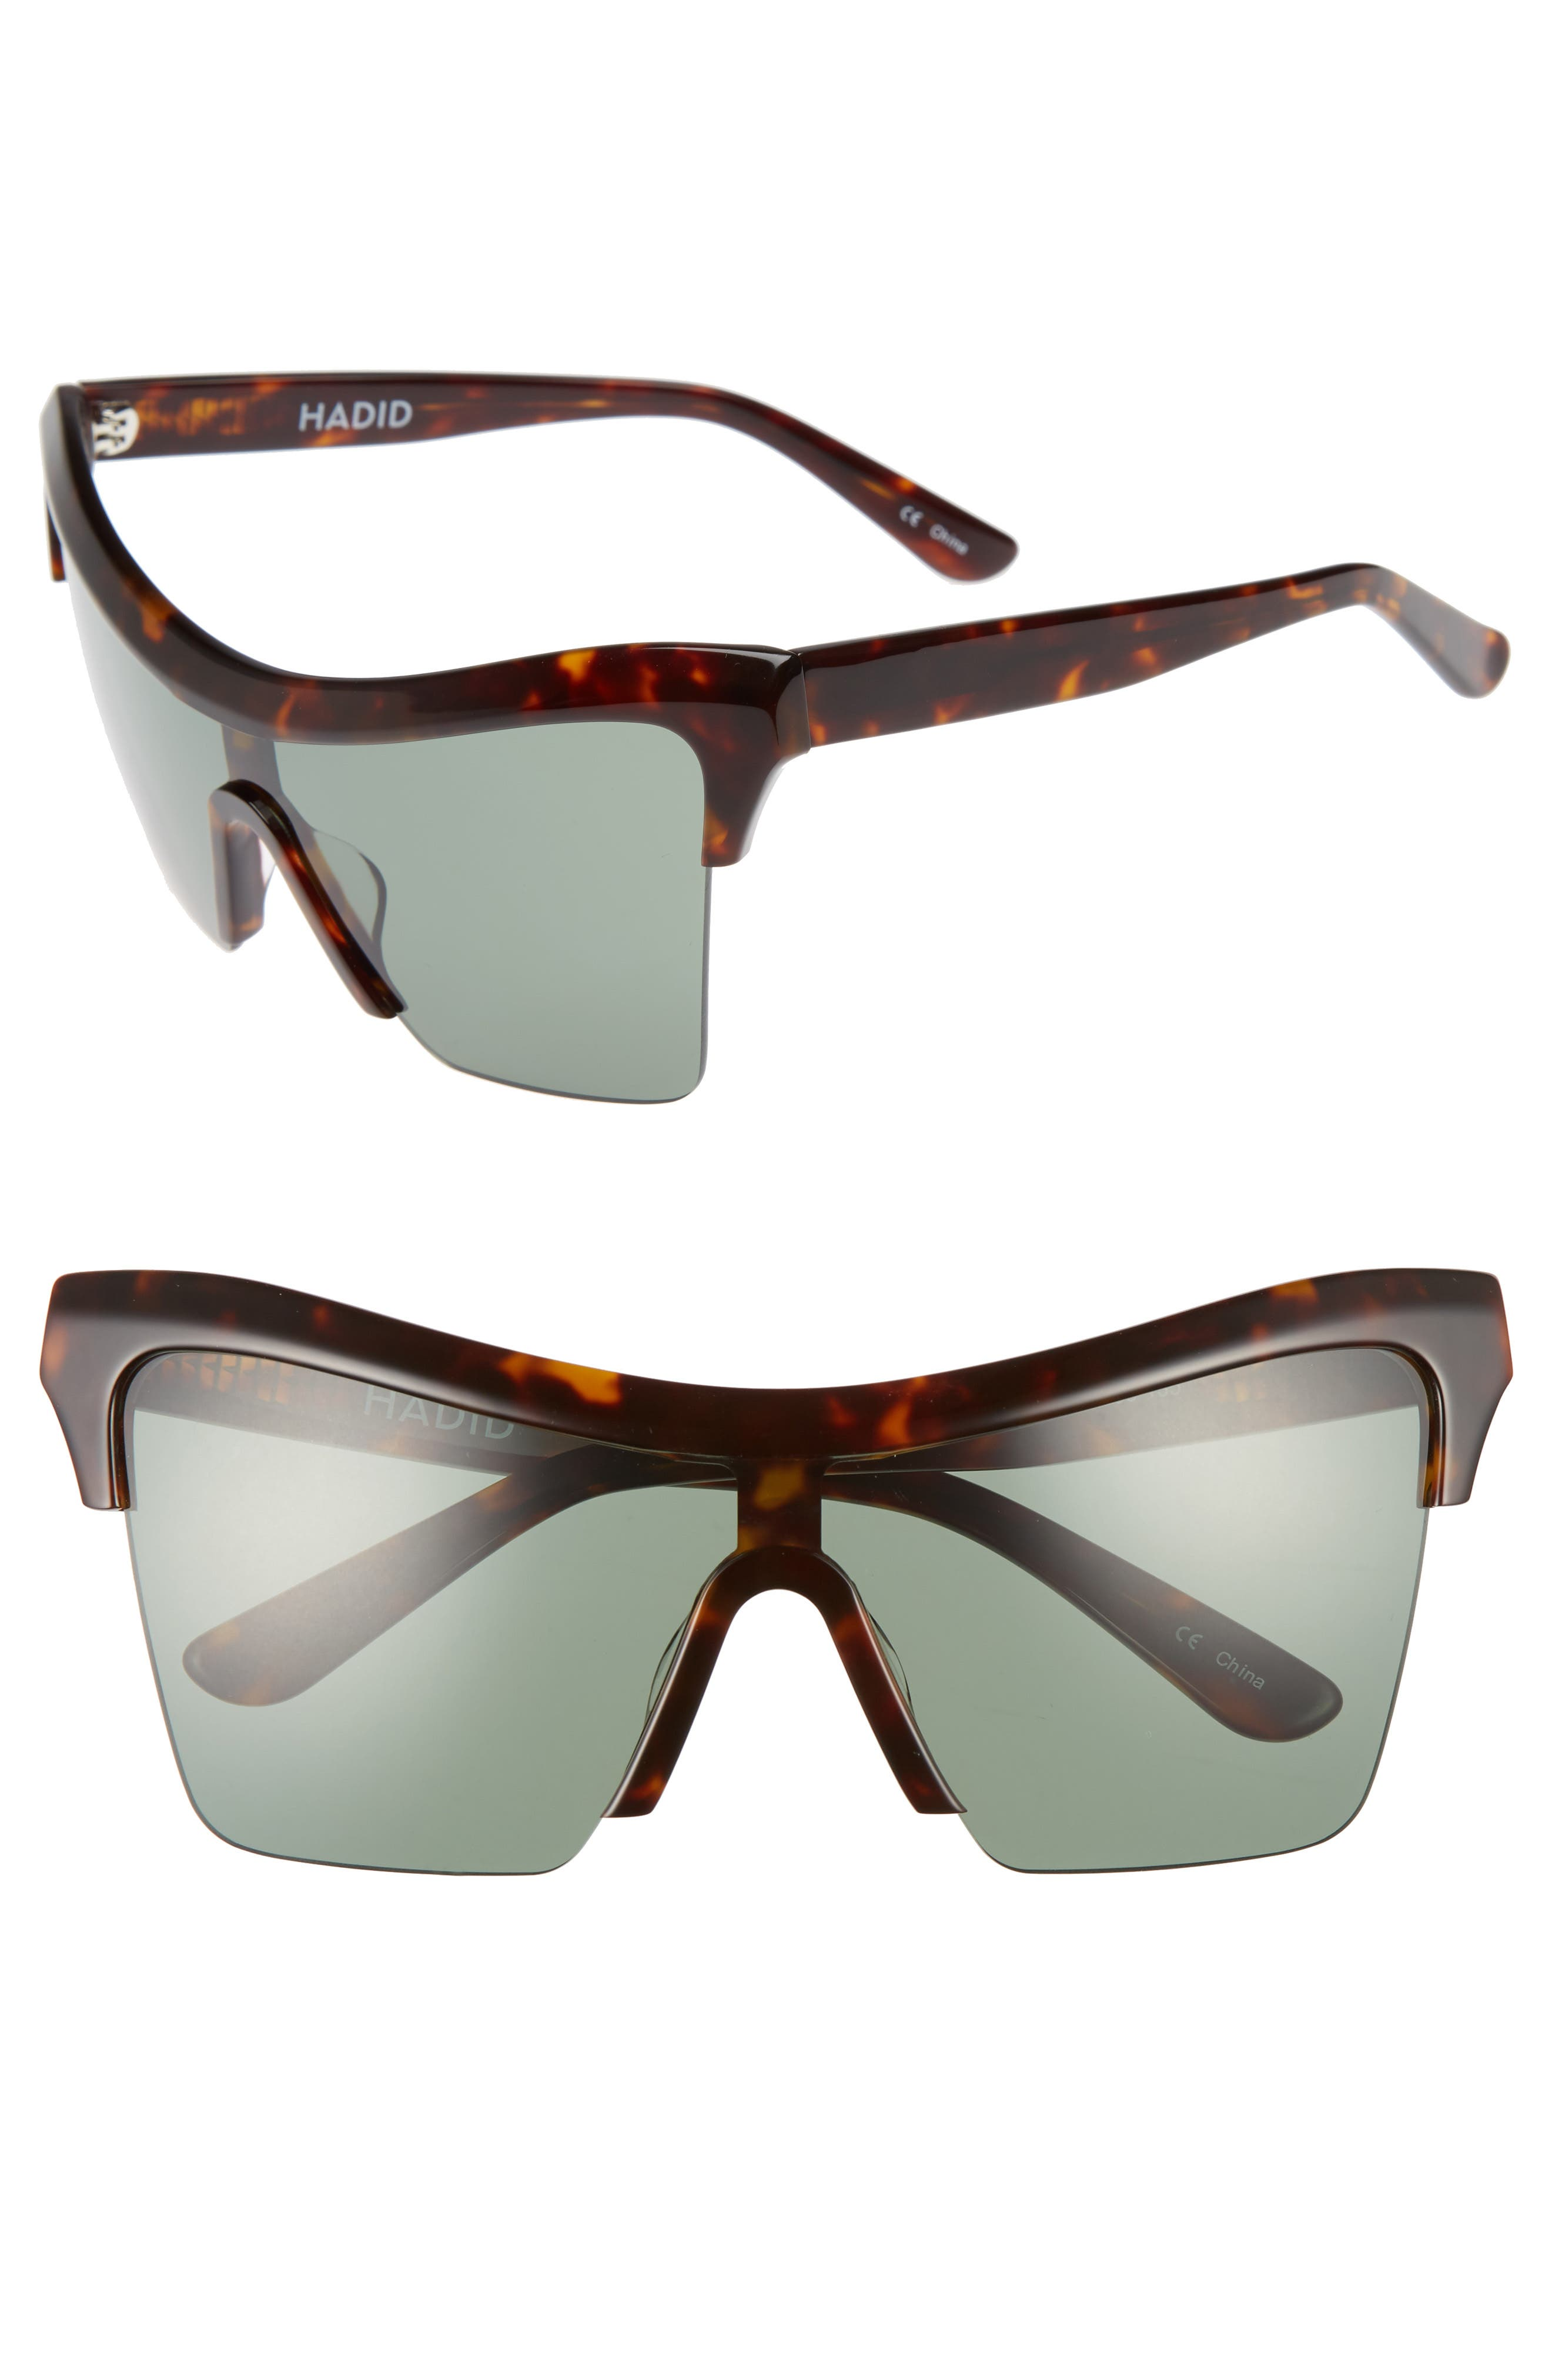 Hadid Passport Control 68mm Sunglasses